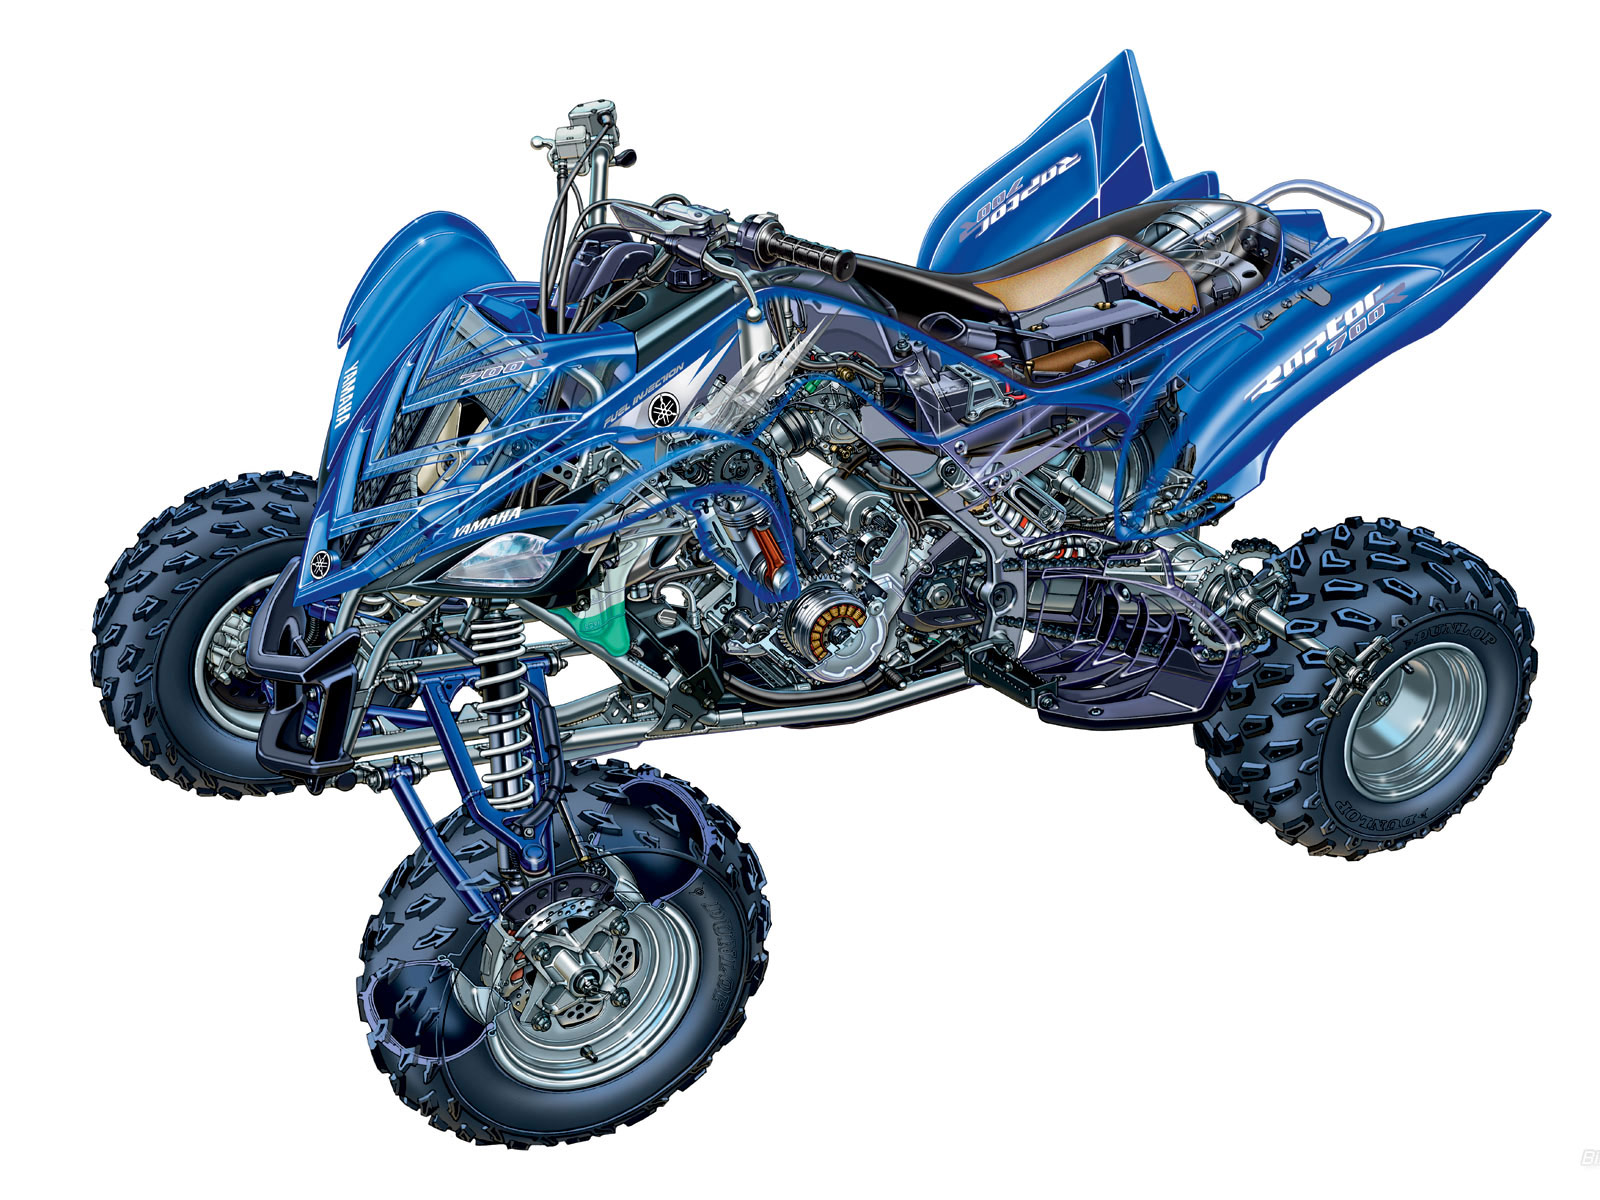 2006 Yamaha Raptor 700r Accident Lawyers Info Atv Wallpapers